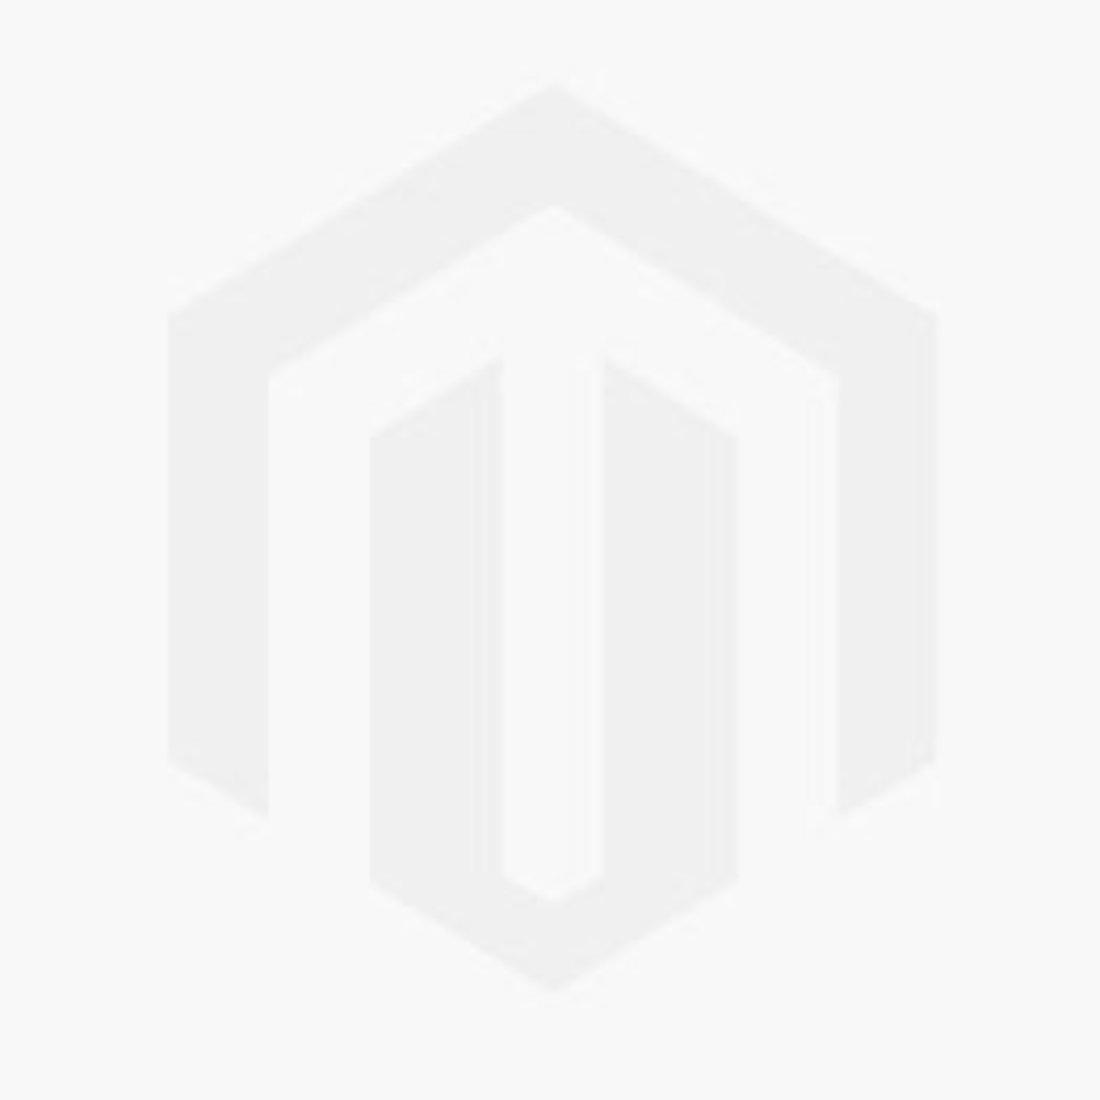 RA 2021 Mini Wall Calendar